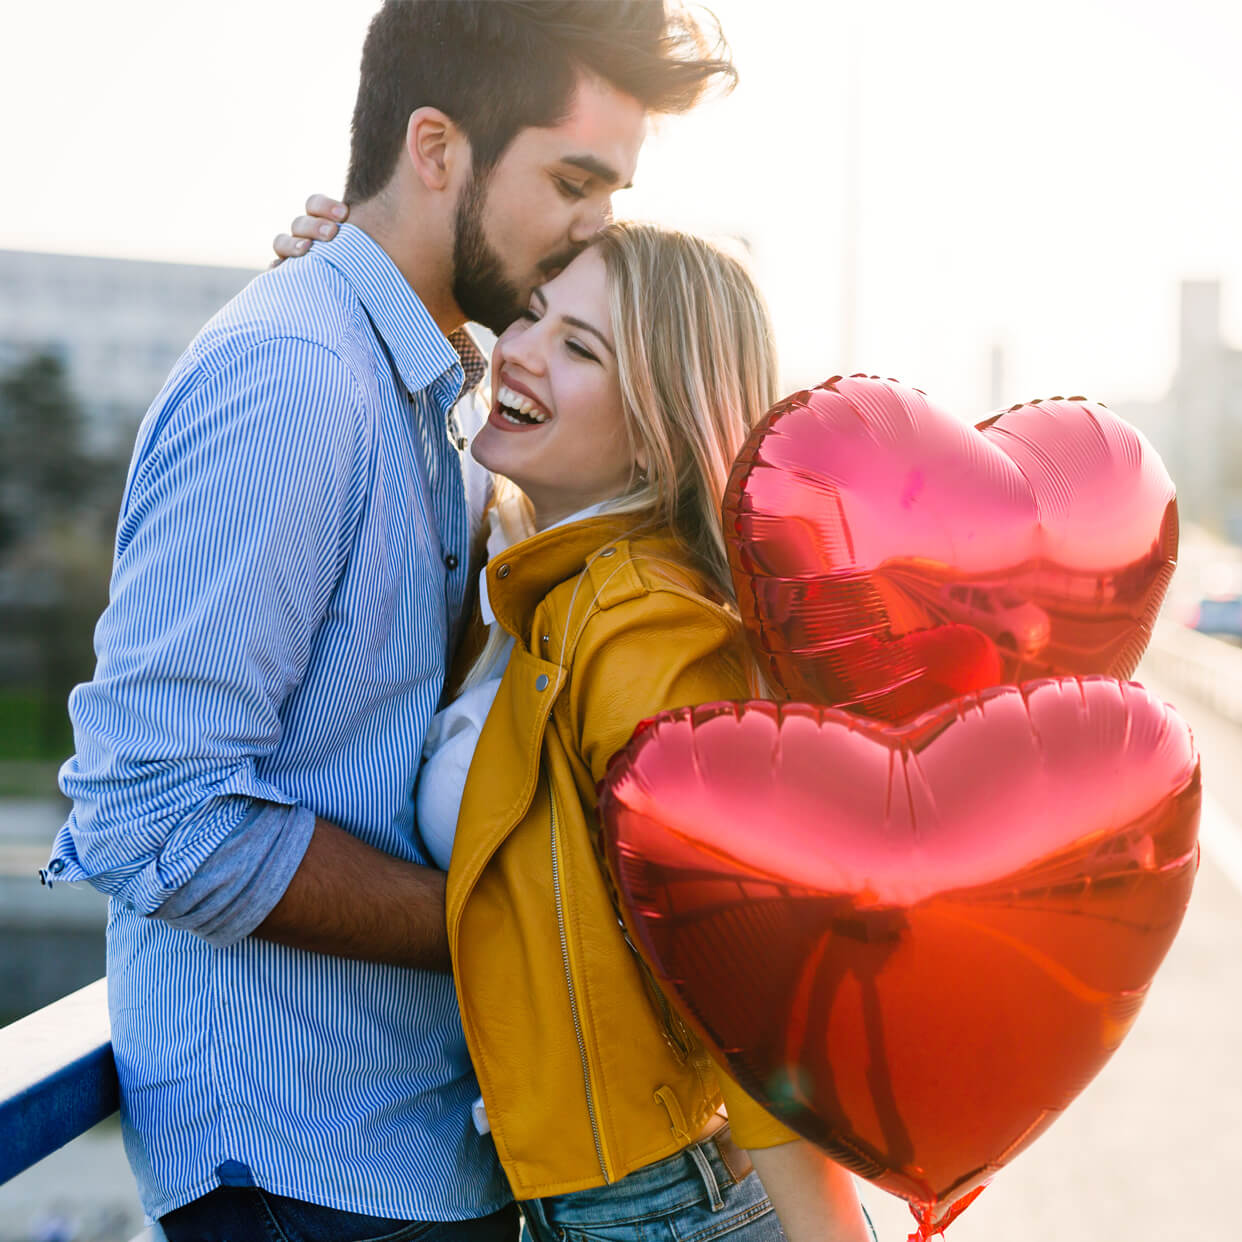 45 Touching Valentine S Day Photoshoot Ideas